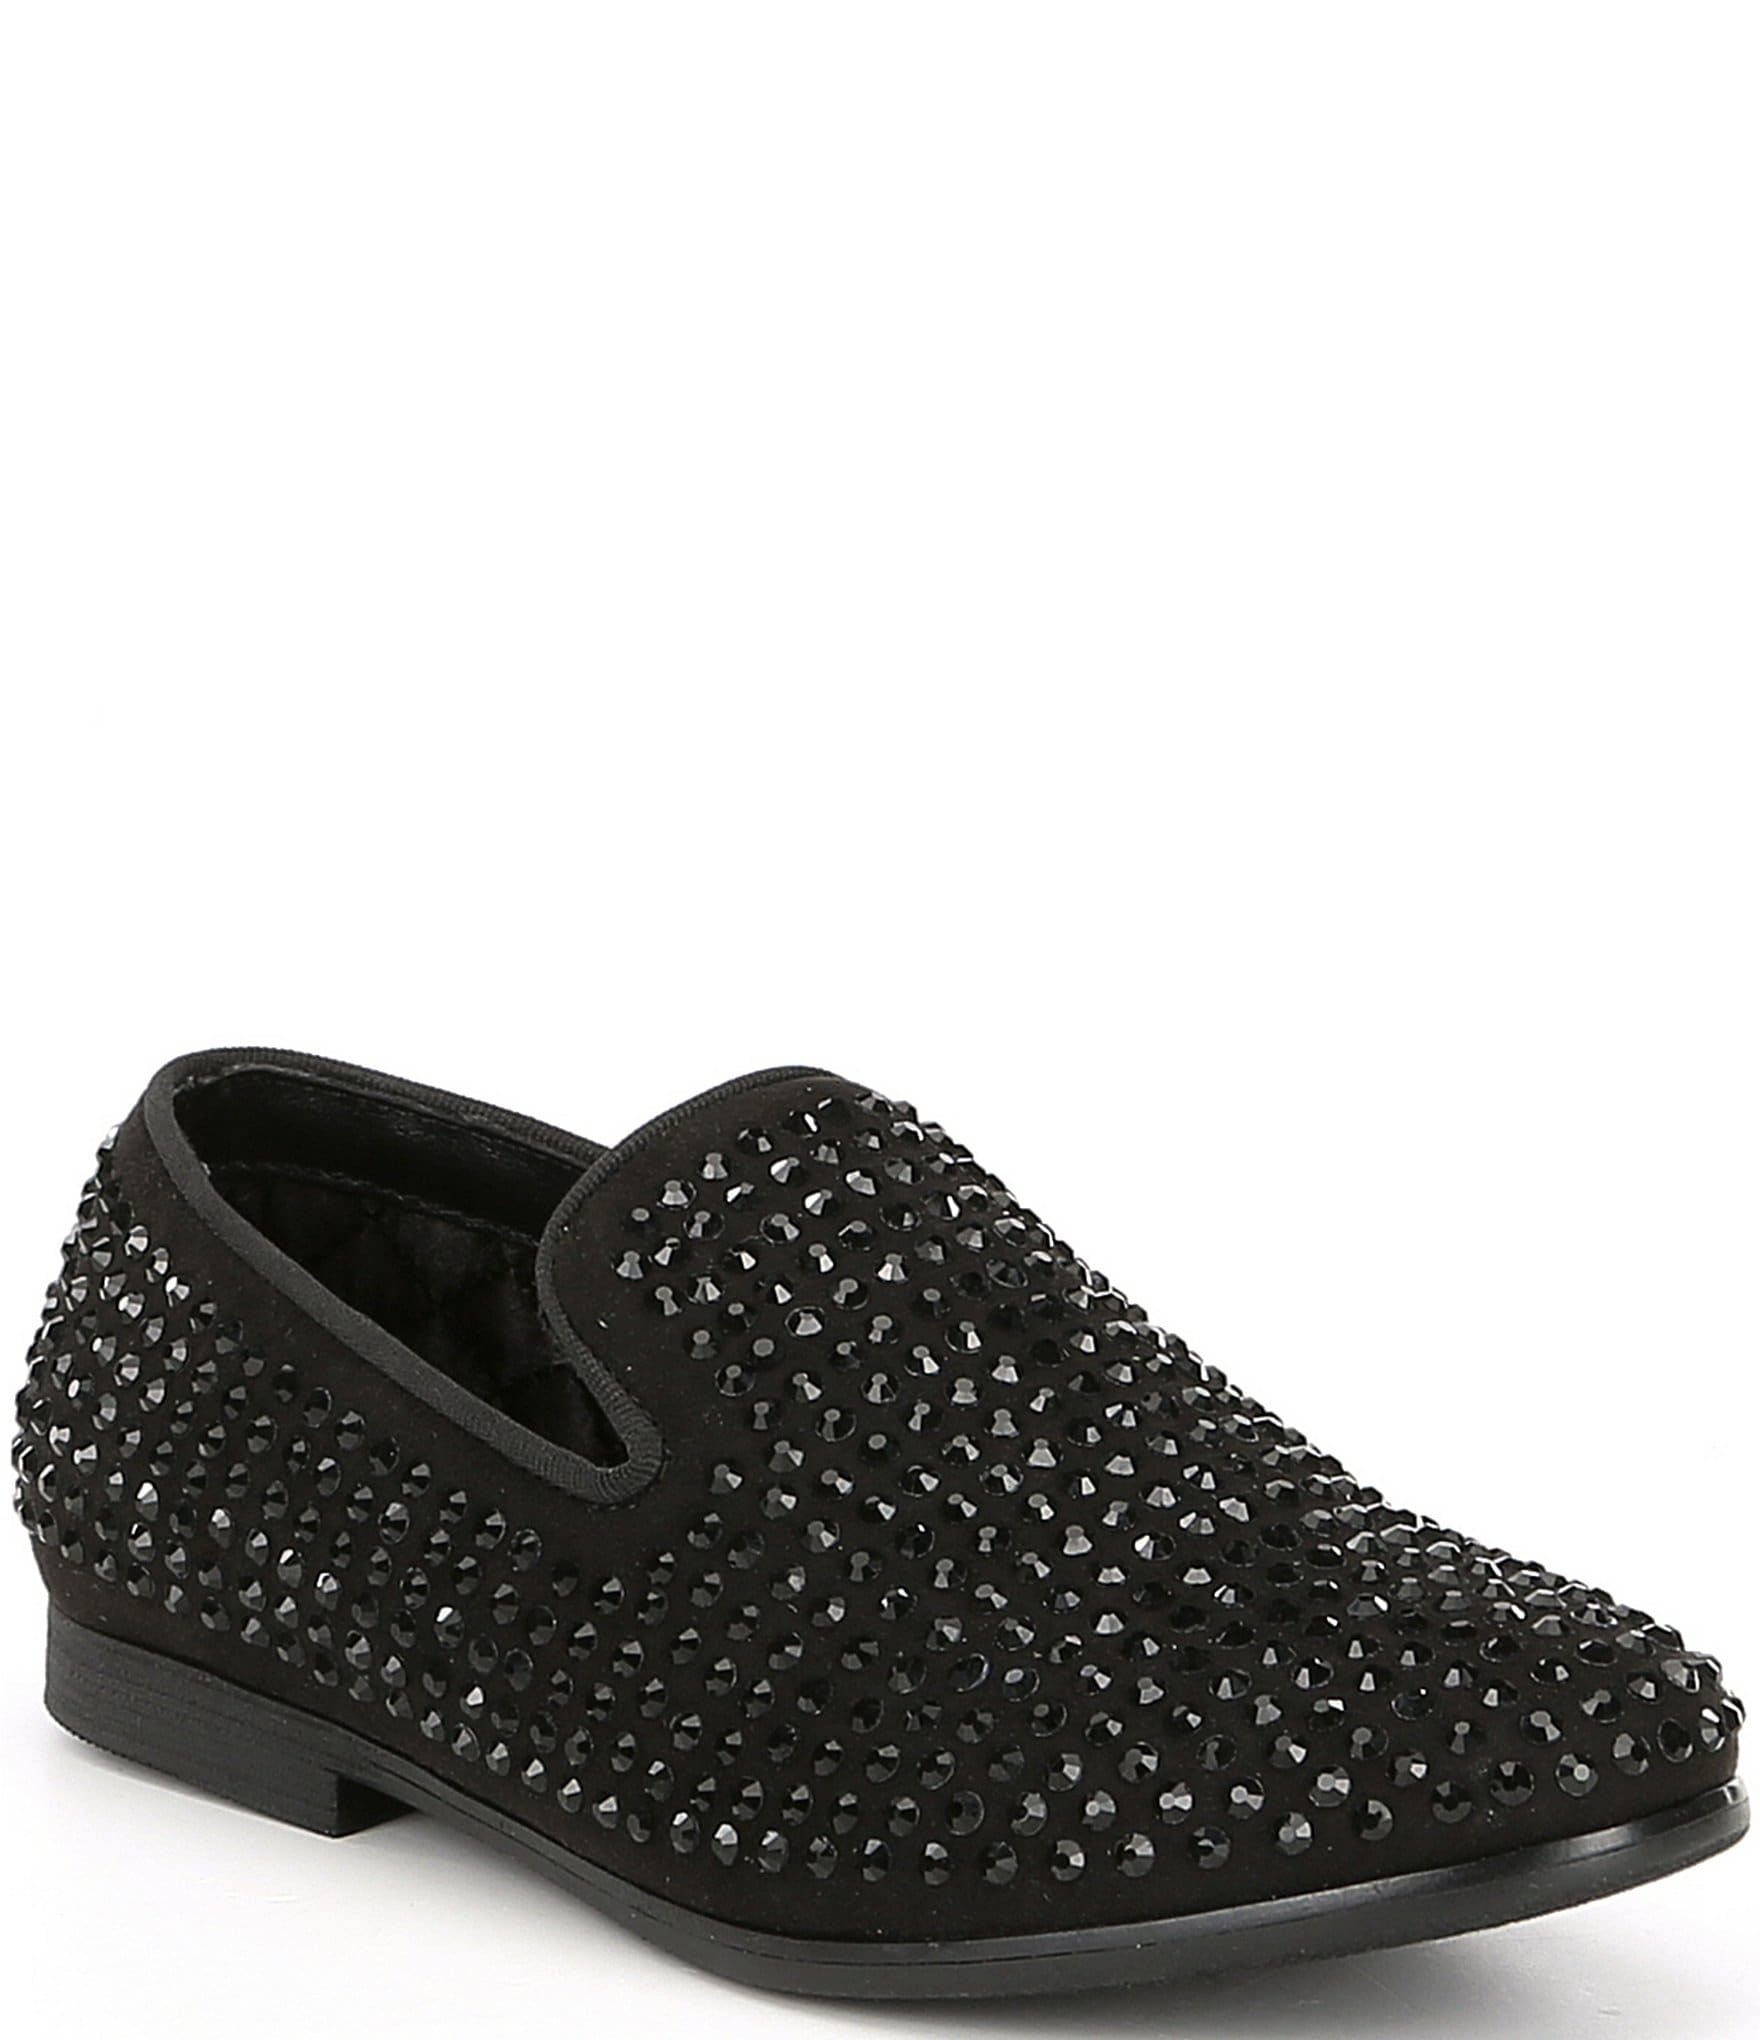 855ba53a264 Steve Madden Boy's B-Caviar Rhinestone Studded Slip On Loafers